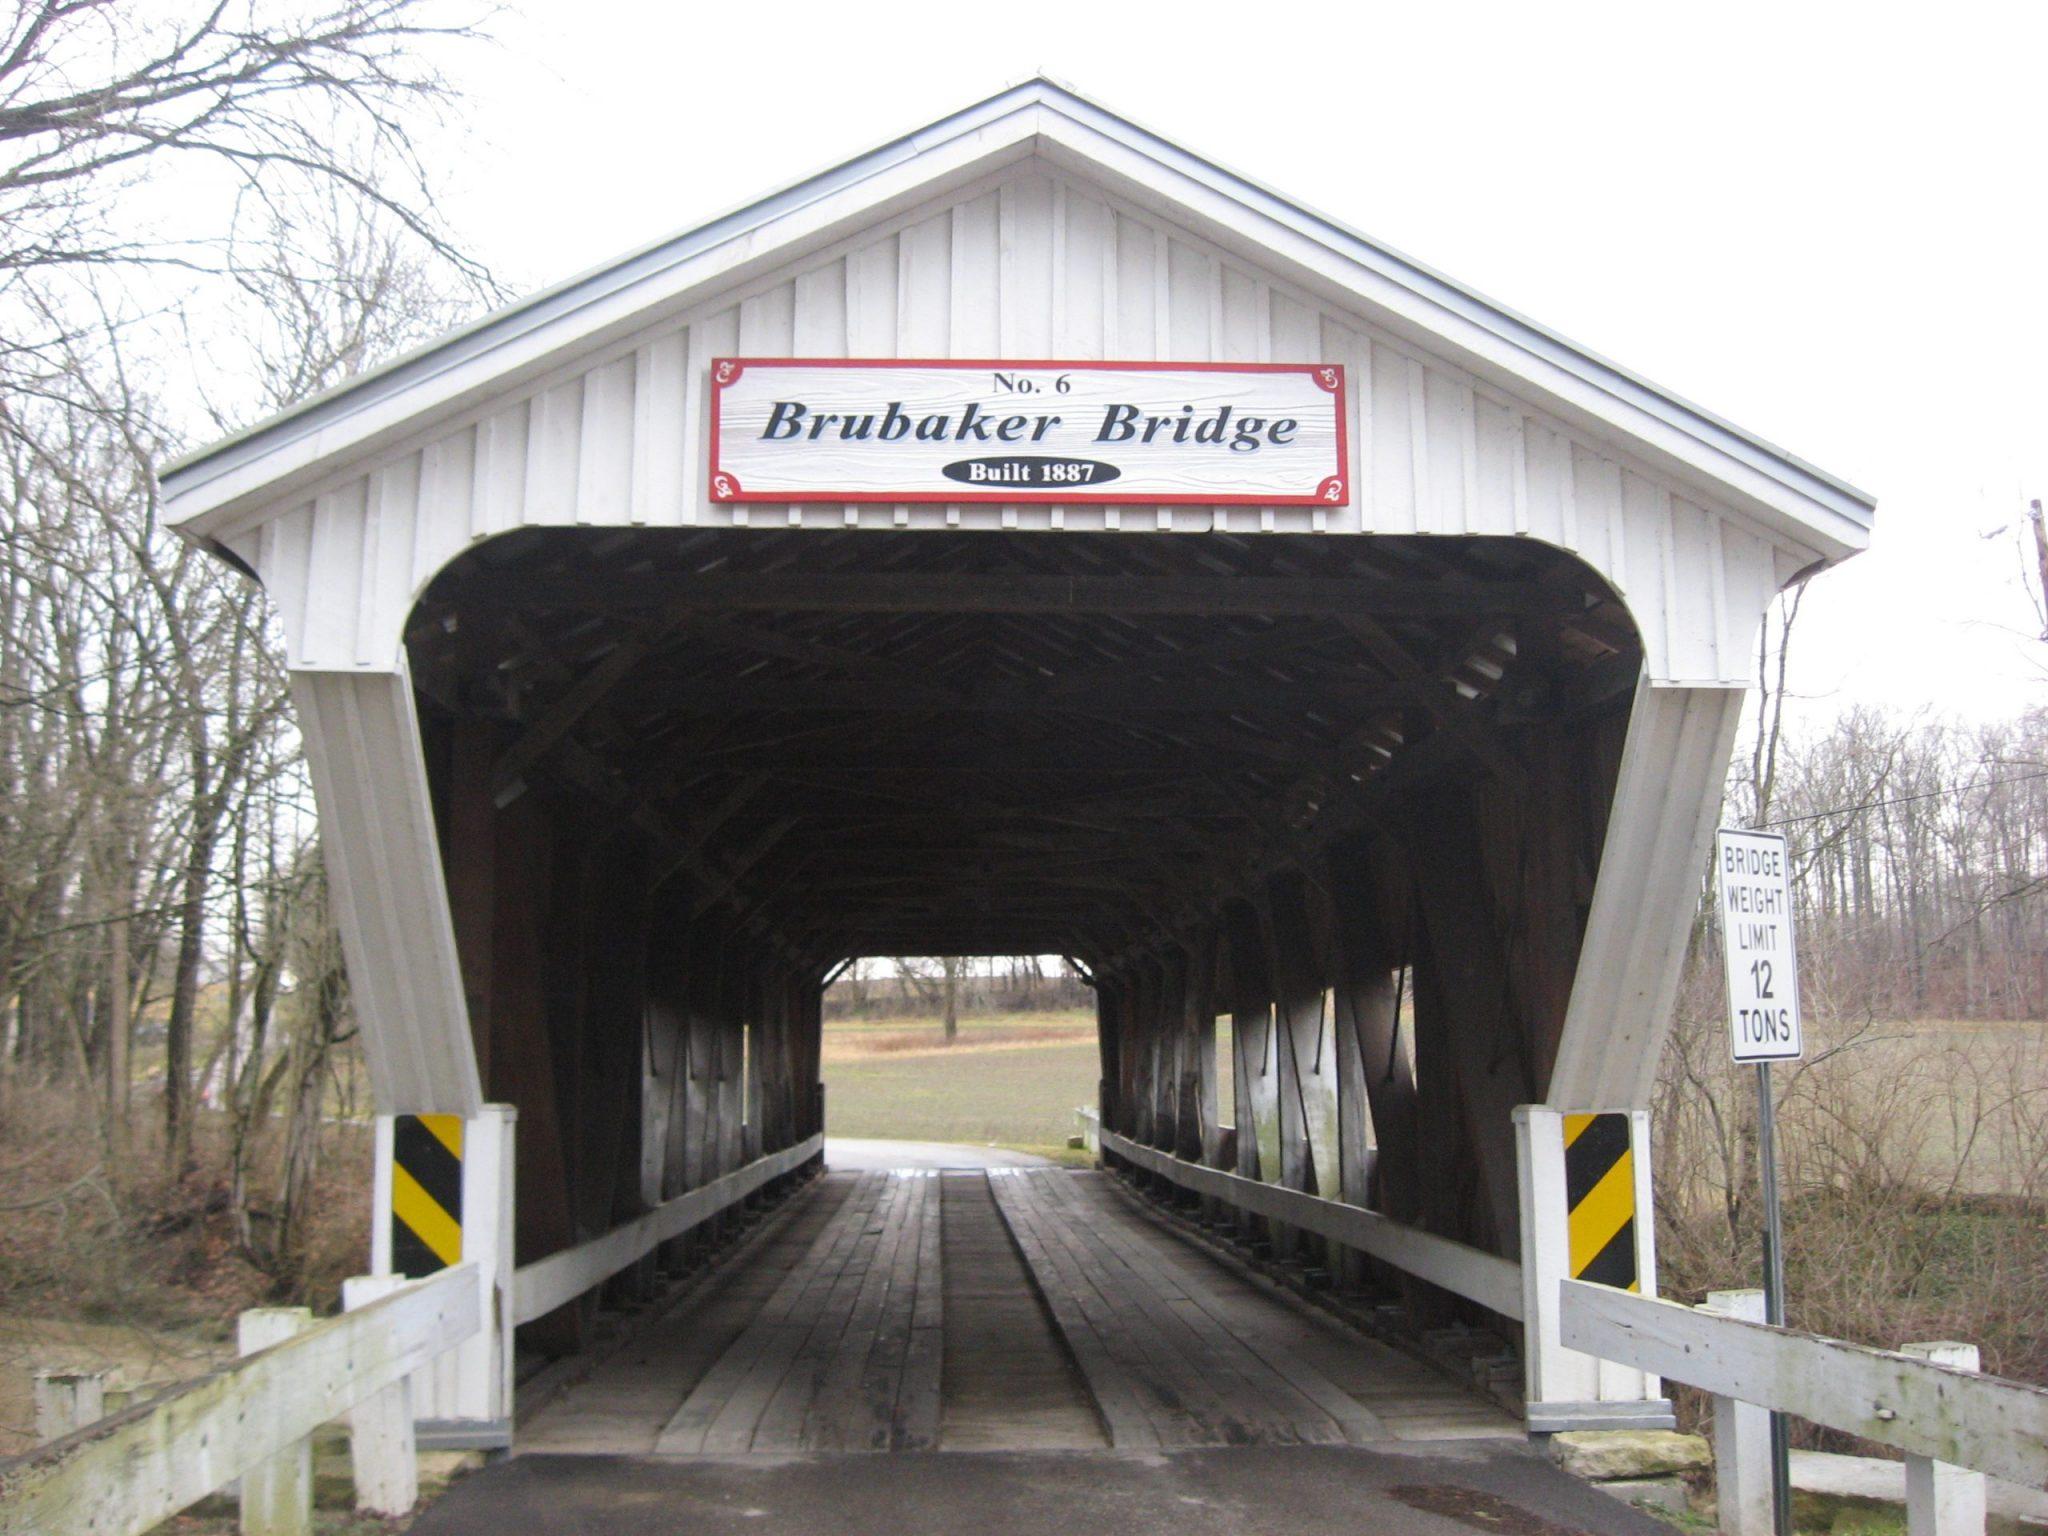 Brubaker Bridge